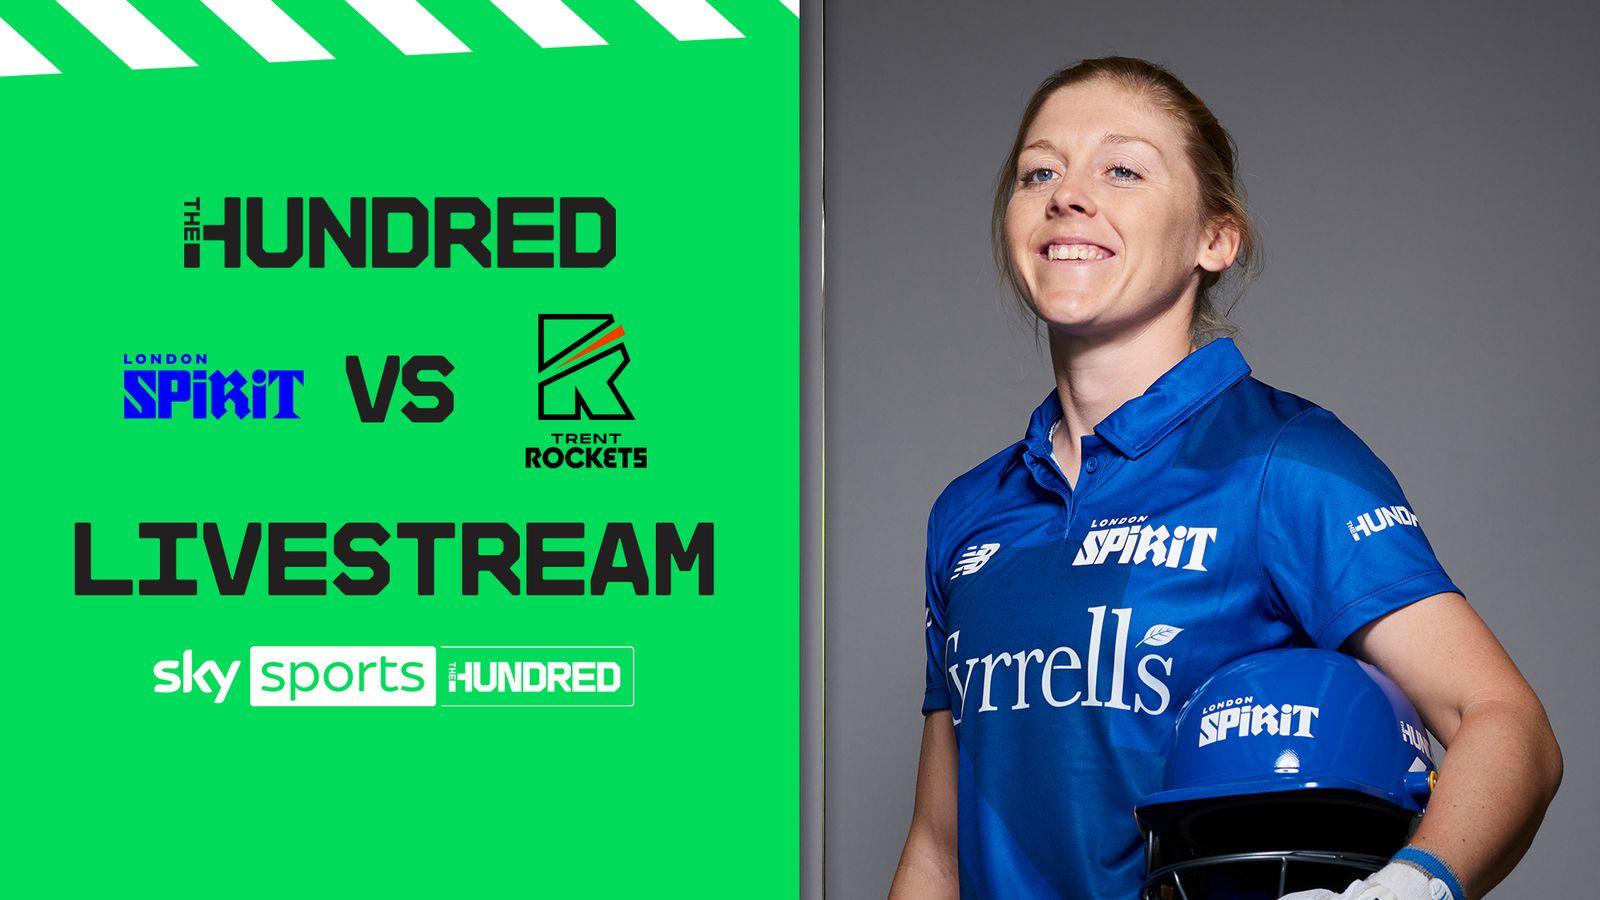 Watch Spirit vs Rockets LIVE!